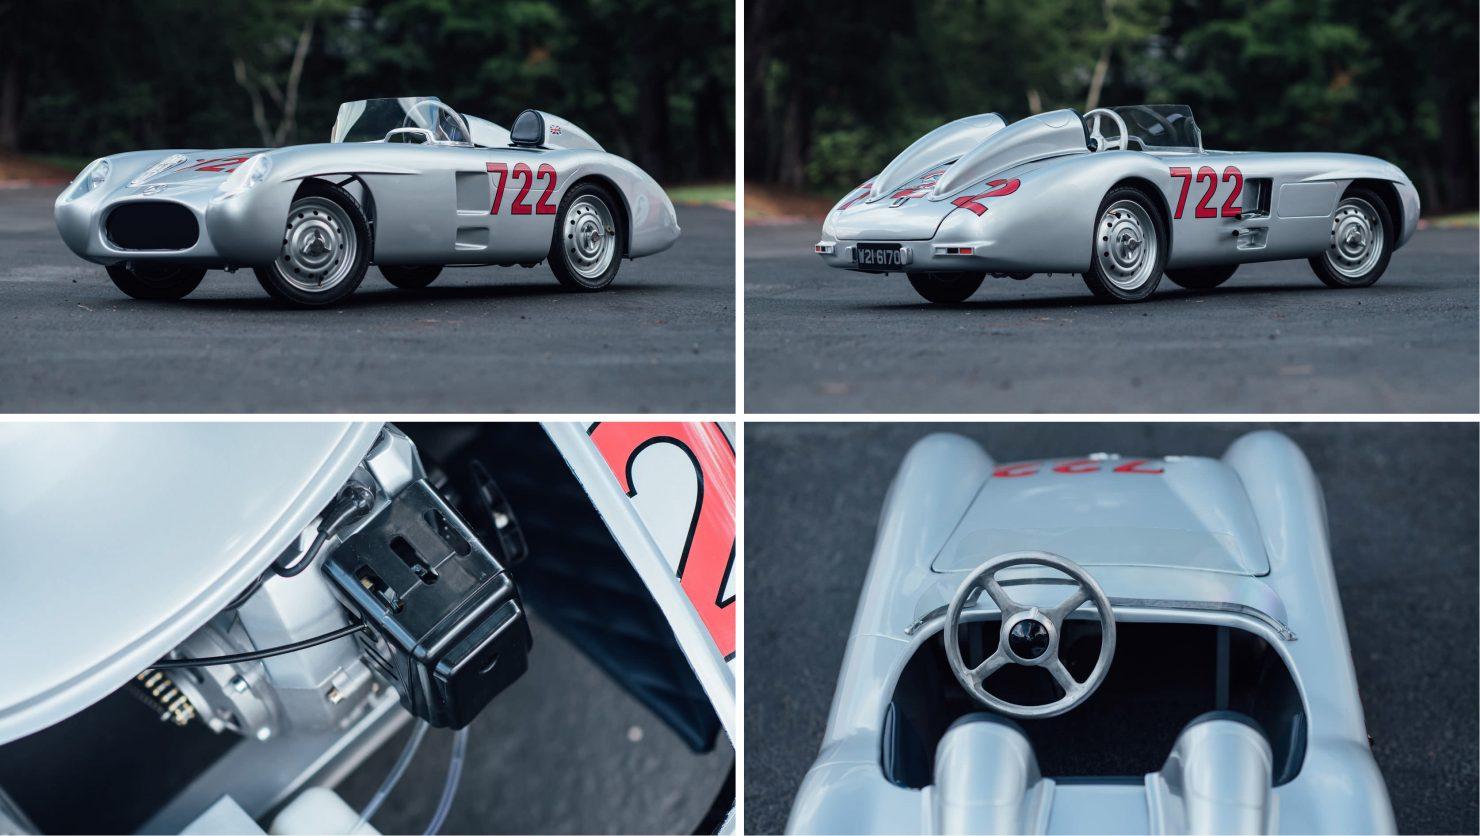 Mercedes Go Kart Collage 1480x836 - Classic Car Go Karts